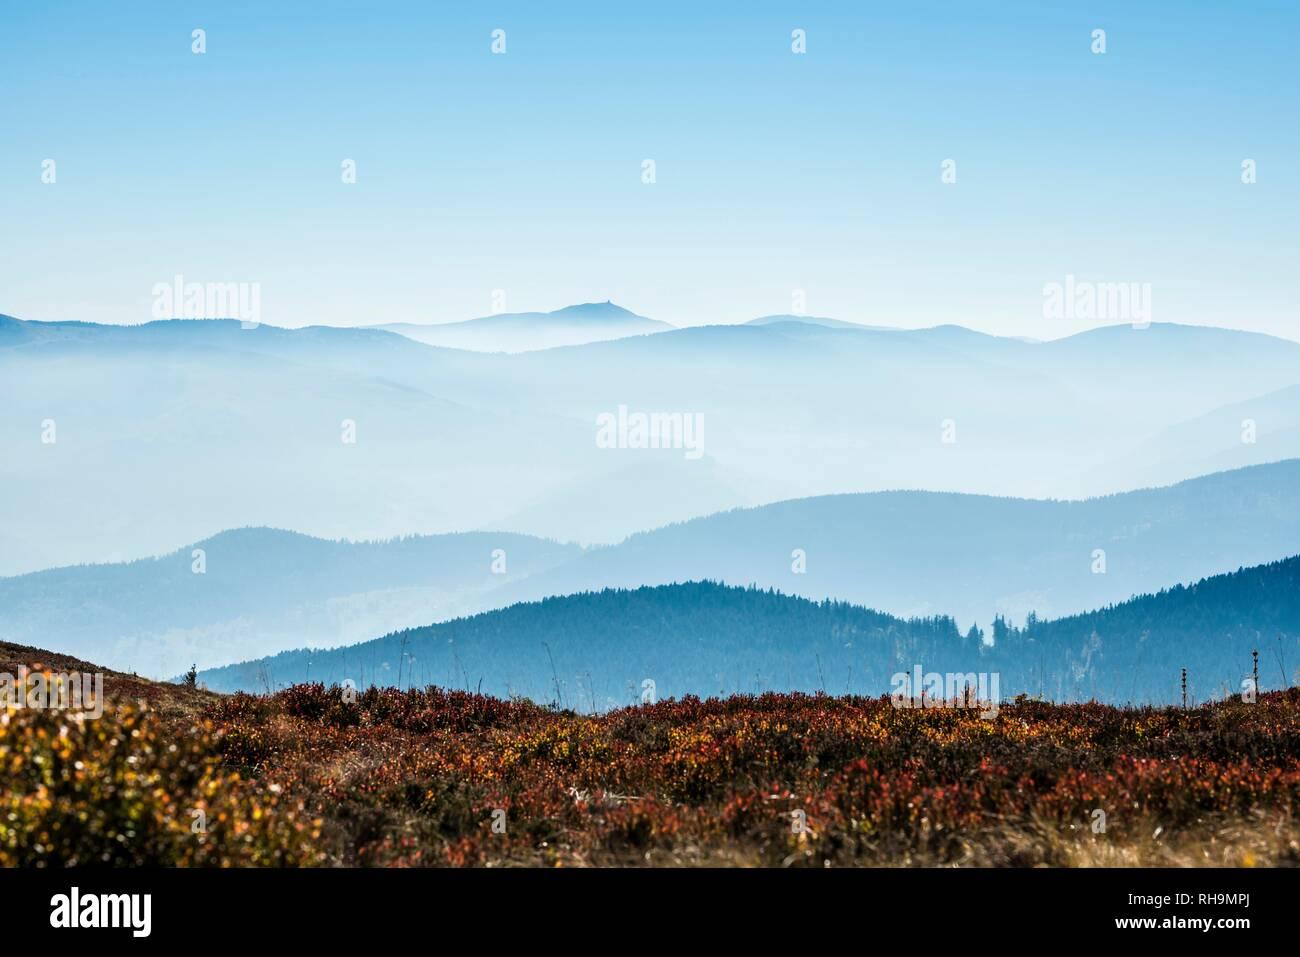 Staggered mountain ranges in the haze, am Hohneck, Col de la Schlucht, Vosges, Alsace-Lorraine, France - Stock Image